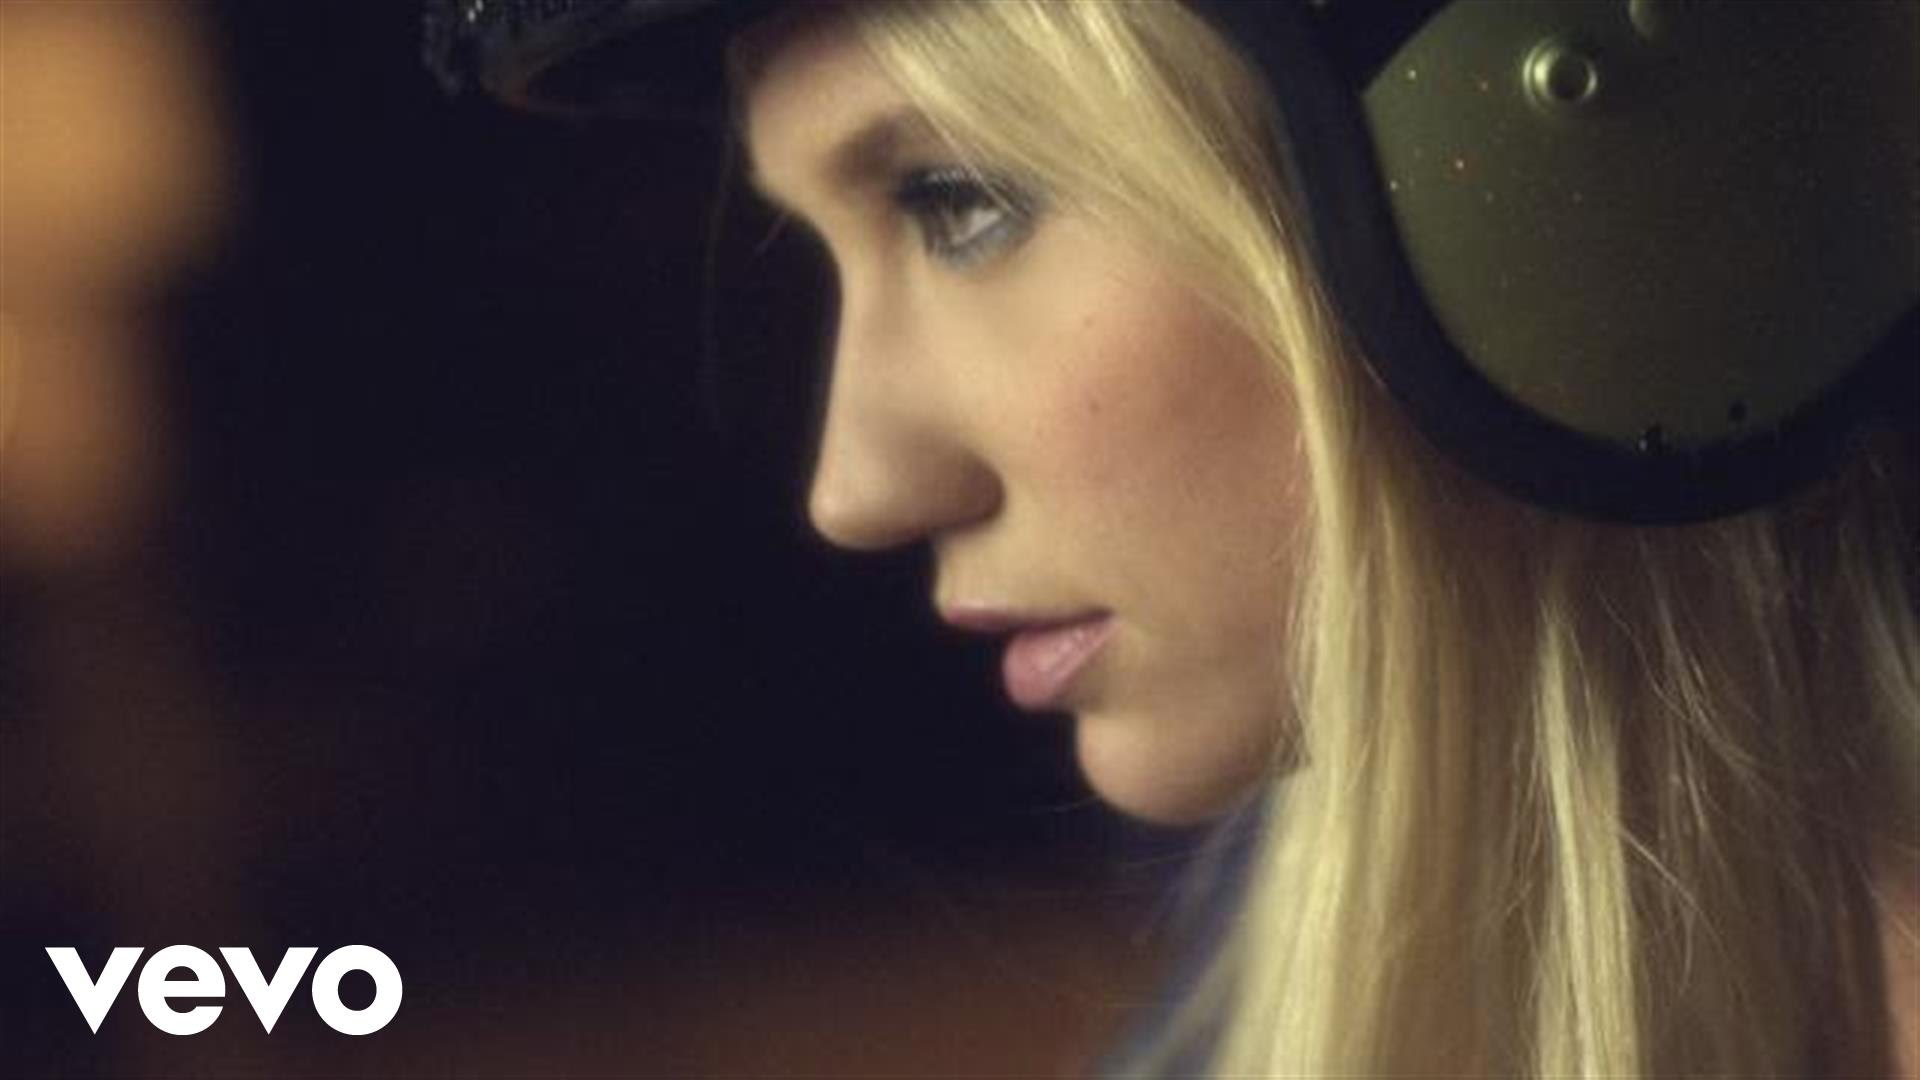 Top 5 best Kesha songs from 'Warrior'